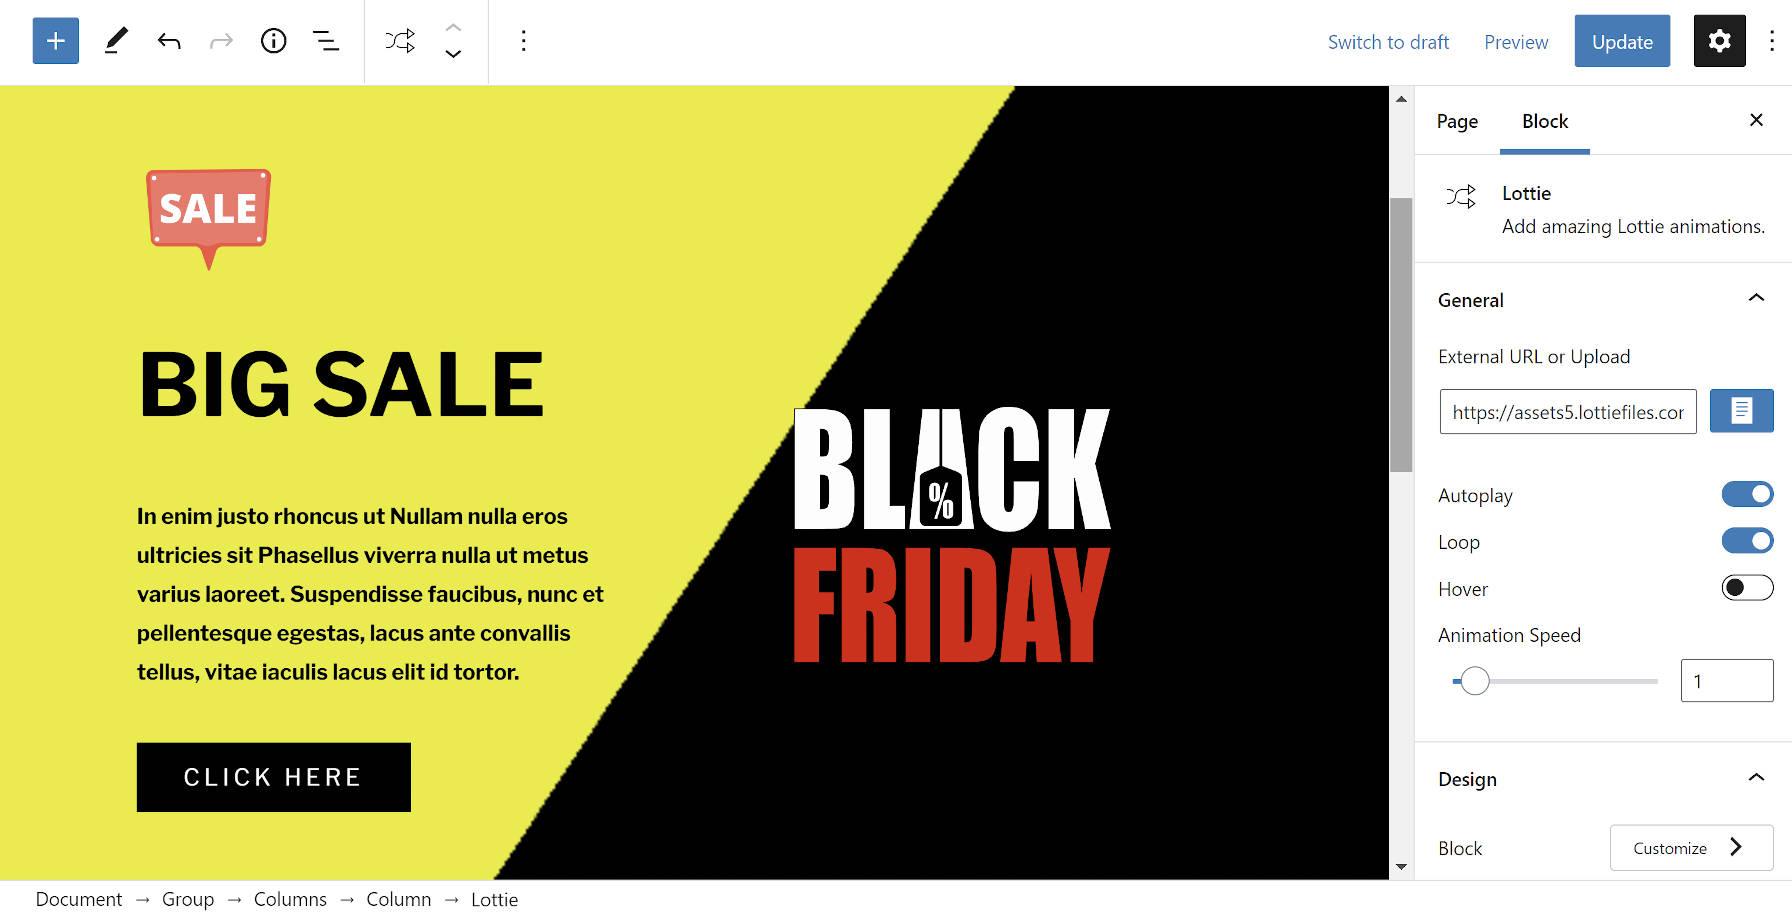 Screenshot of a Black Friday Lottie animation block pattern from Gutenberg Hub.